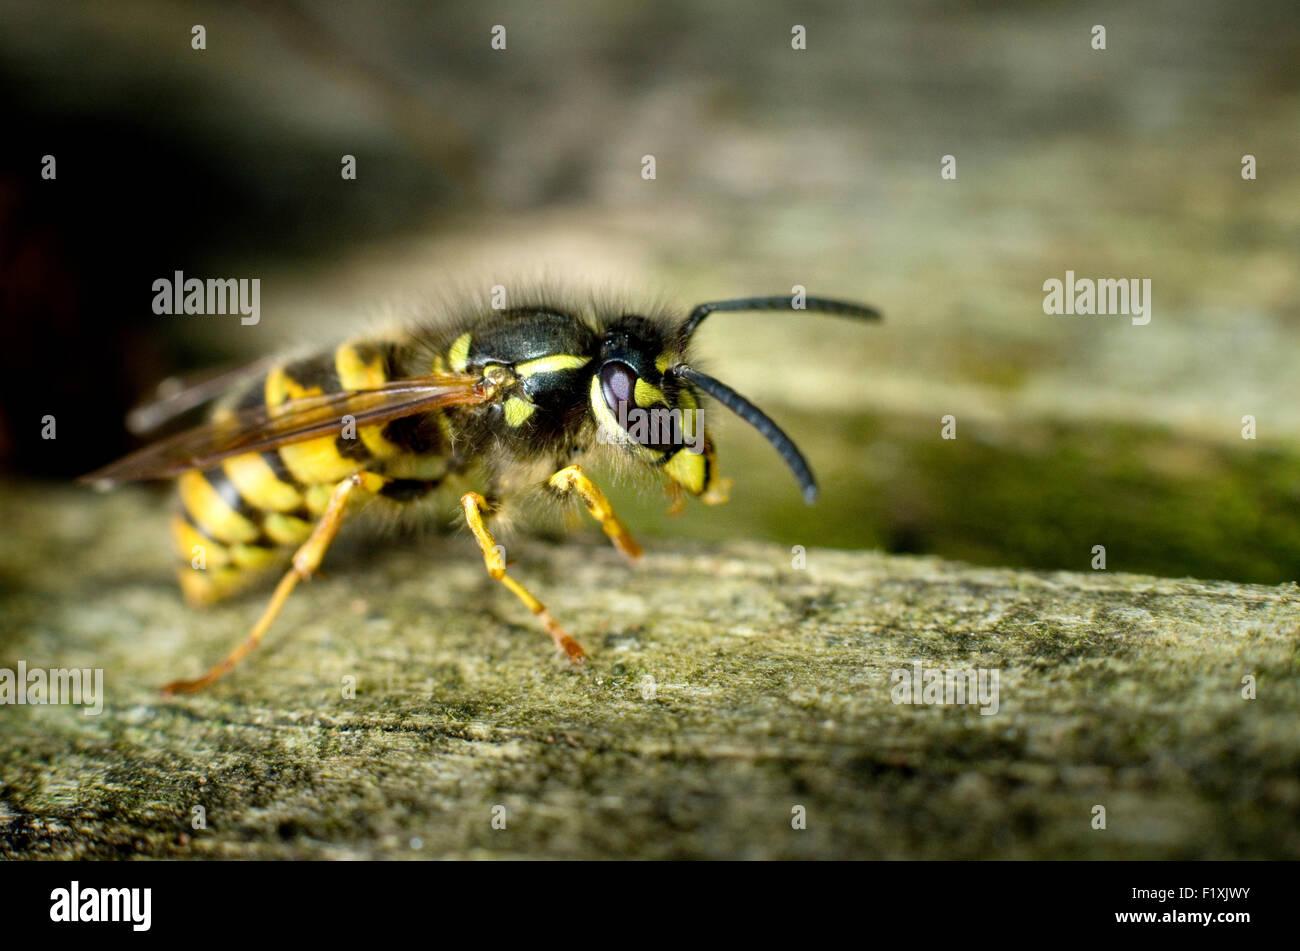 Common wasp (Vespula vulgaris) on wood. - Stock Image